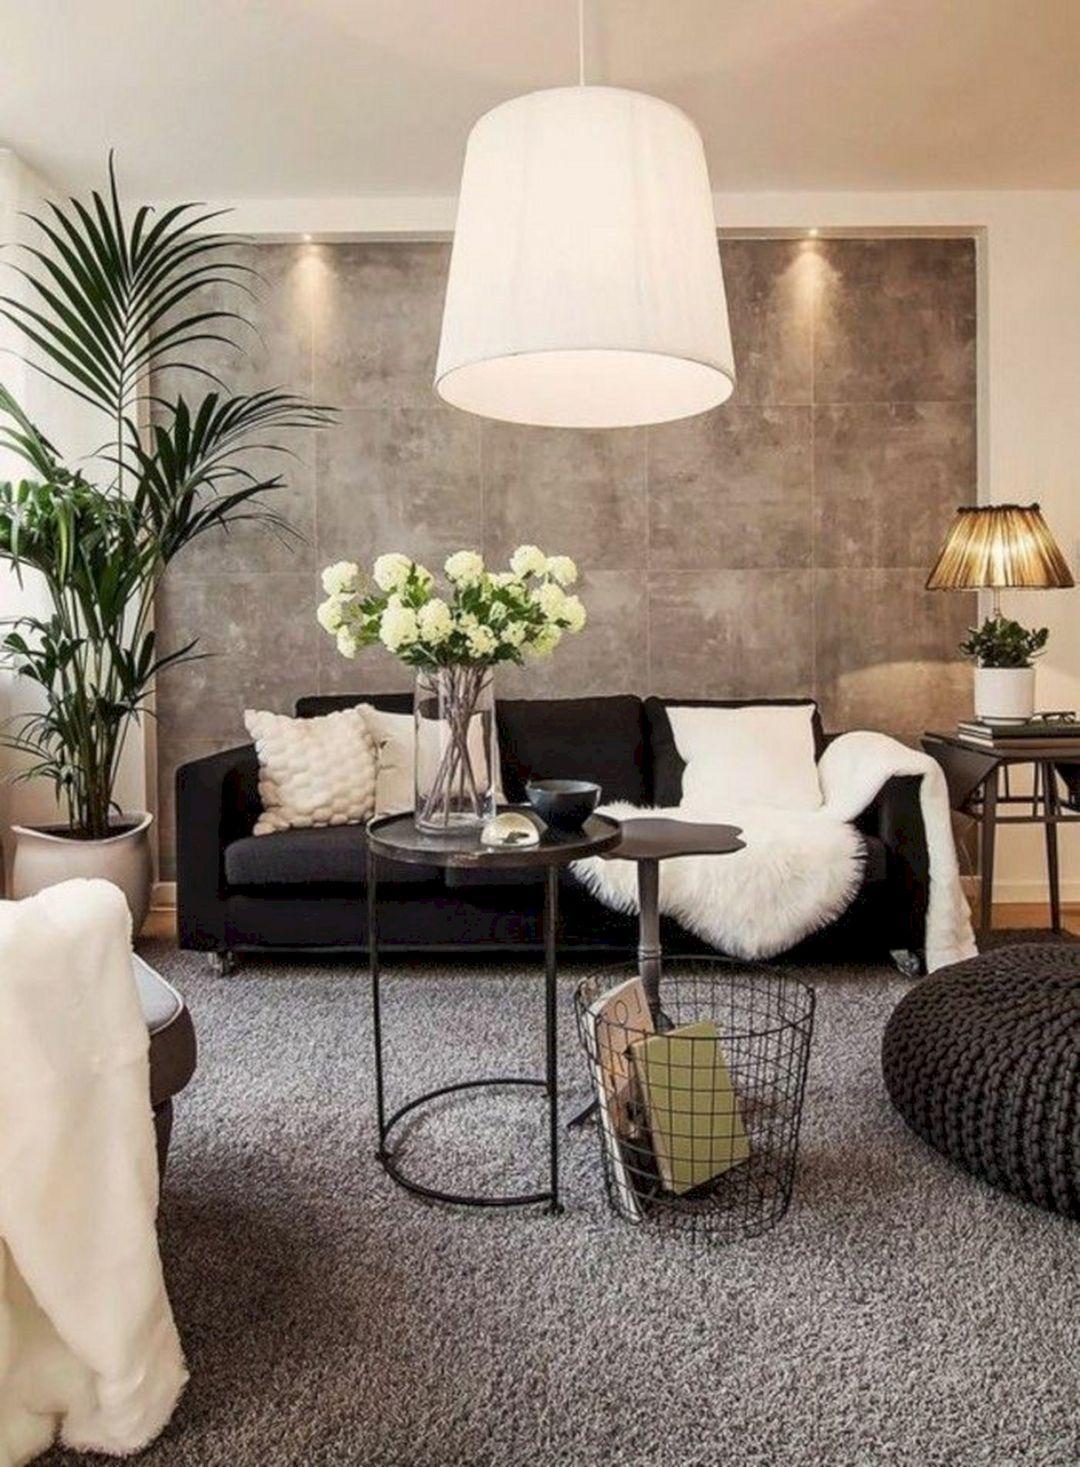 17 Interesting Modern Living Room Design For More Elegant And Comfort